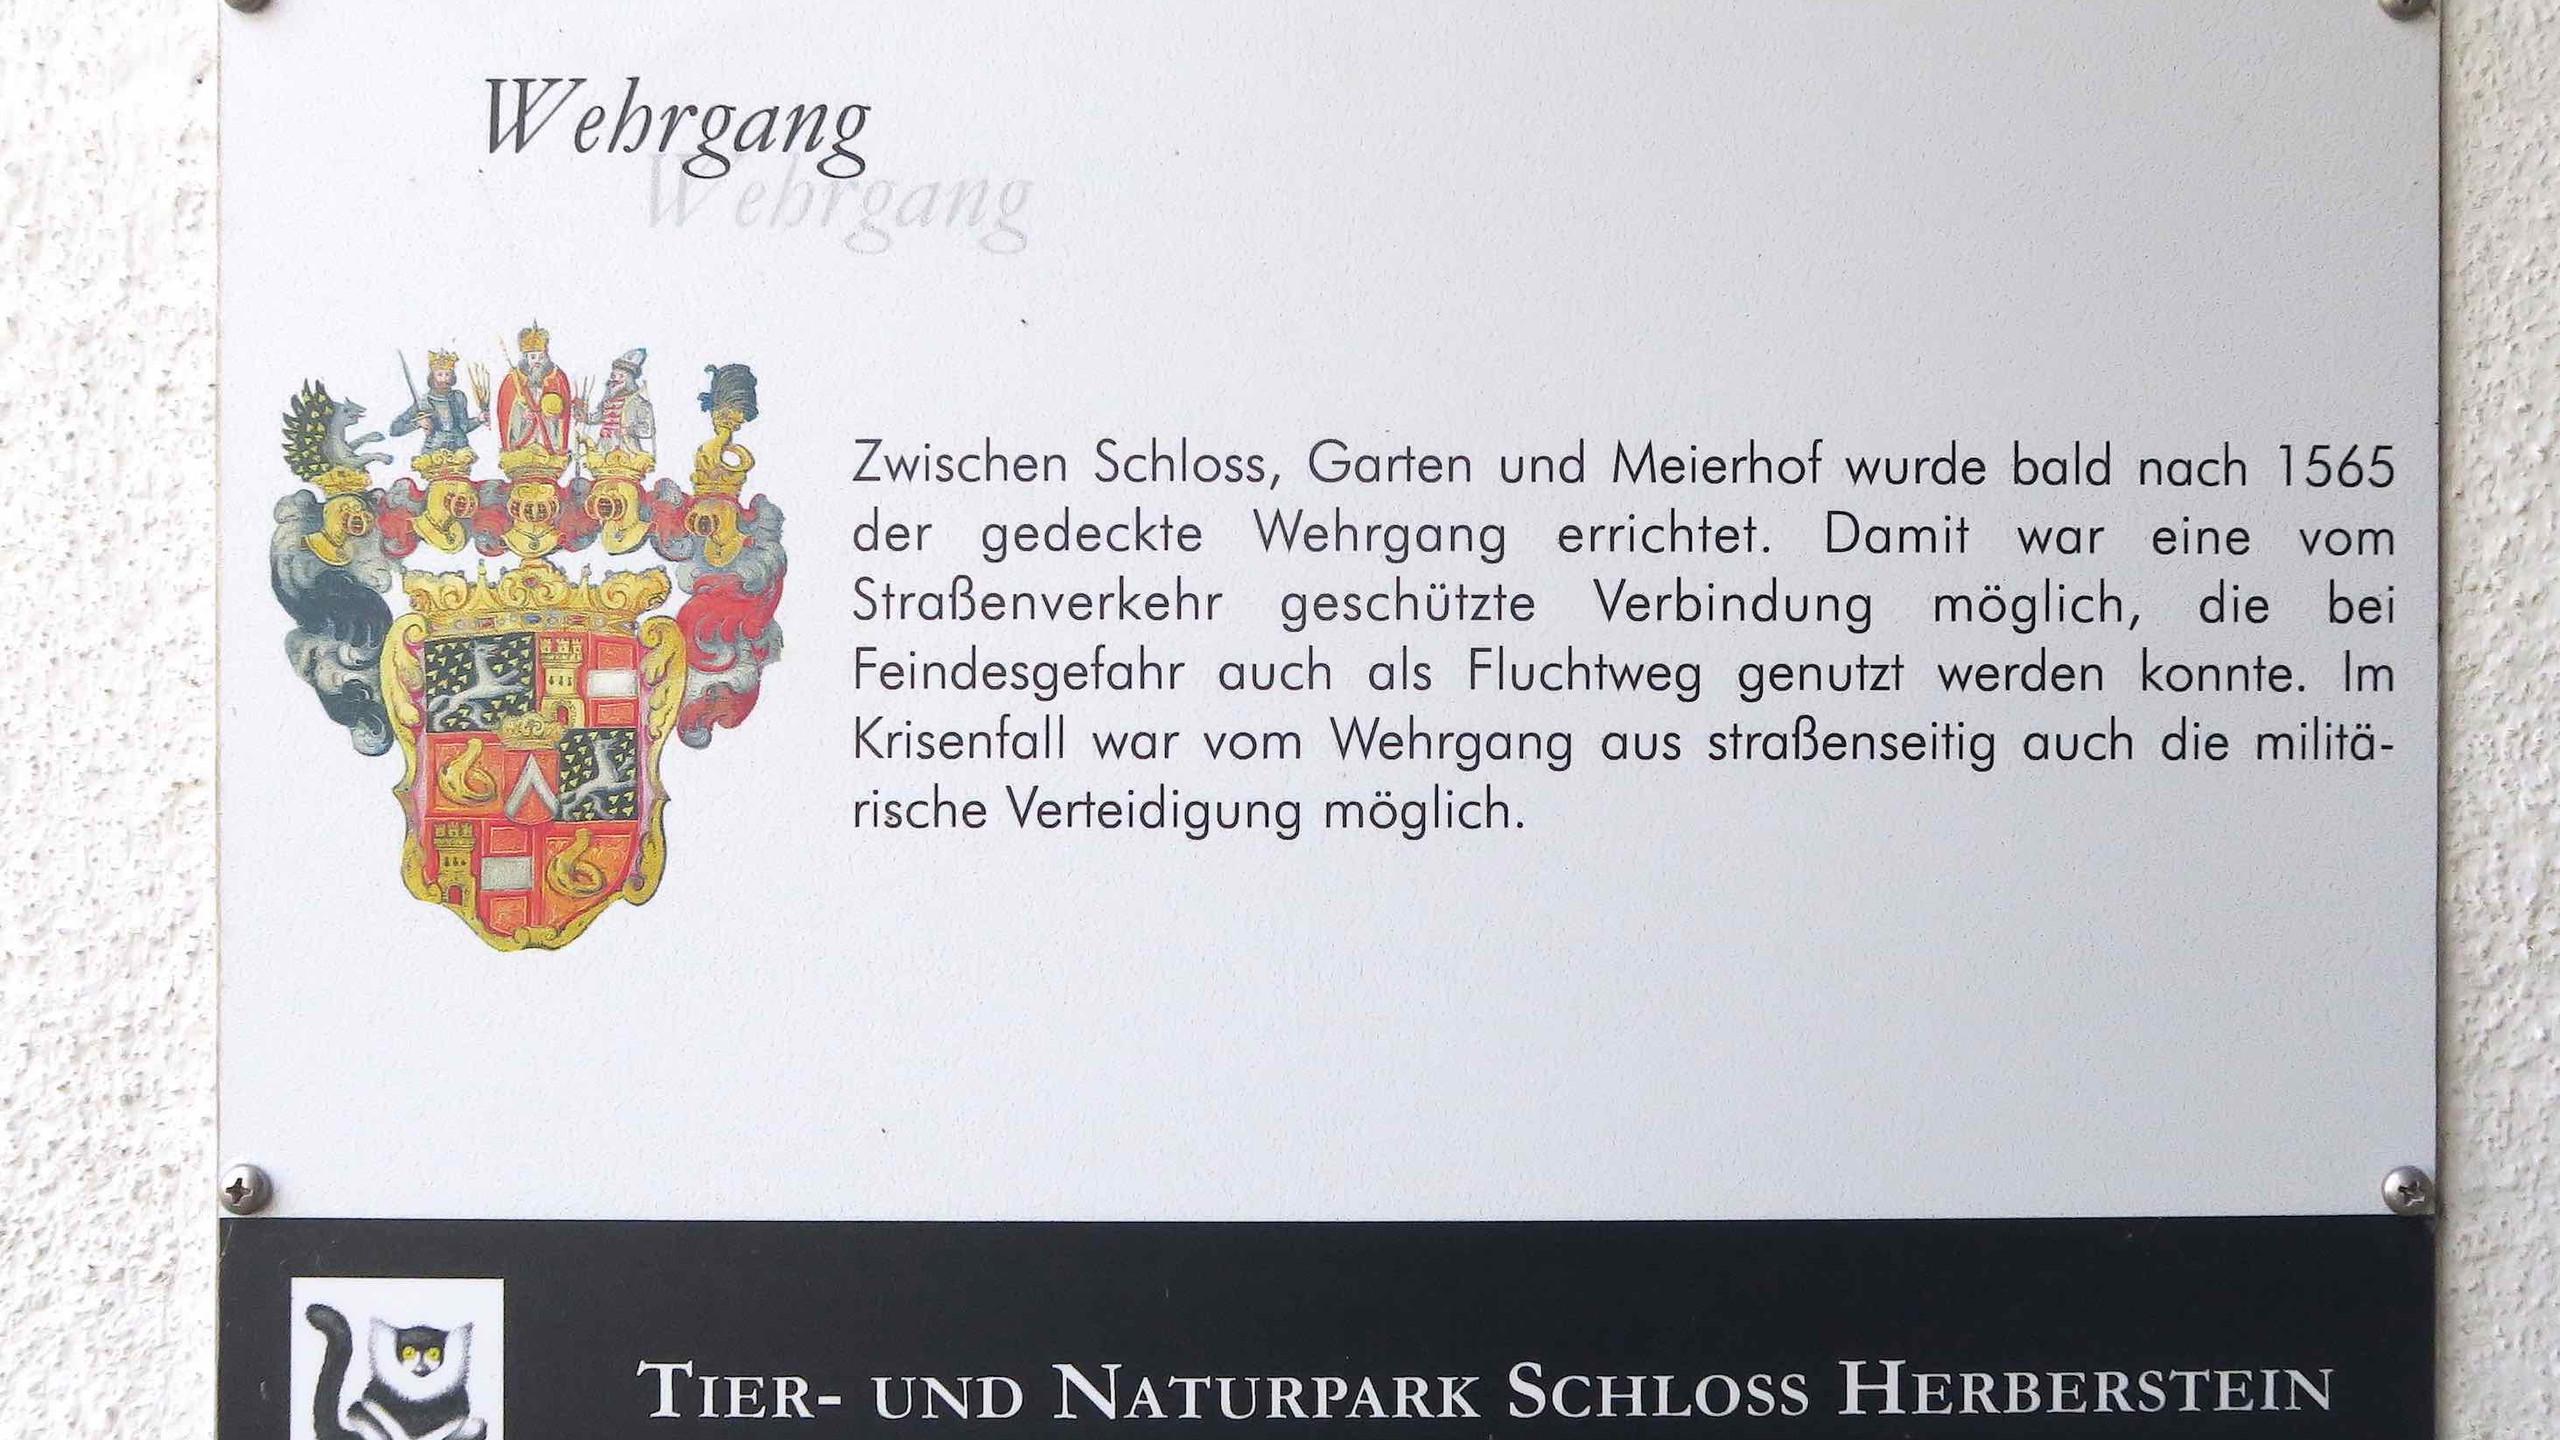 IMG_1612 Schloss Herberstein Austria 2017 Wilhelm W. Kohl kopie 2